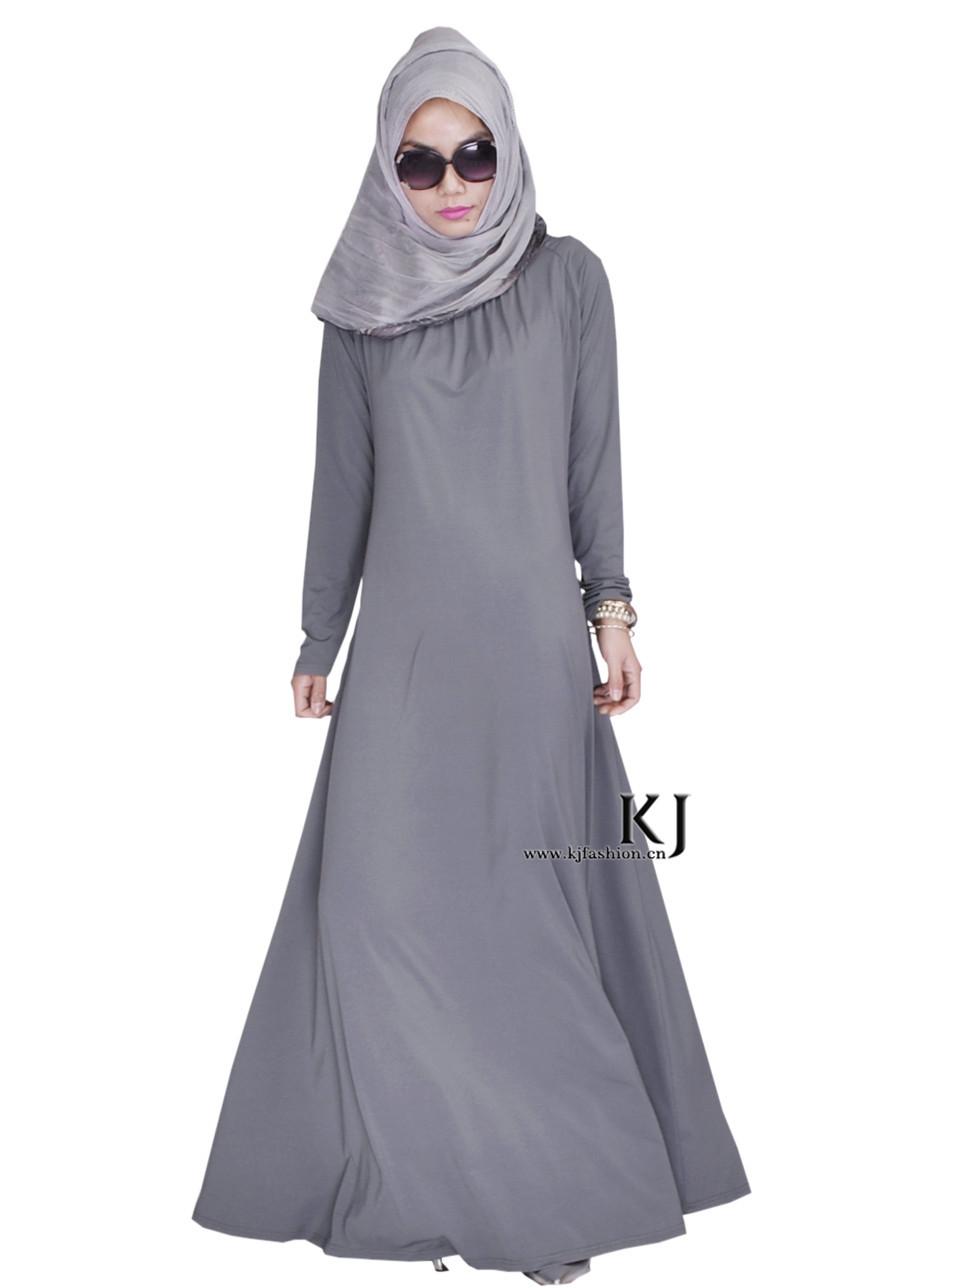 Hijab Kleding Promotie-Winkel voor promoties Hijab Kleding ...